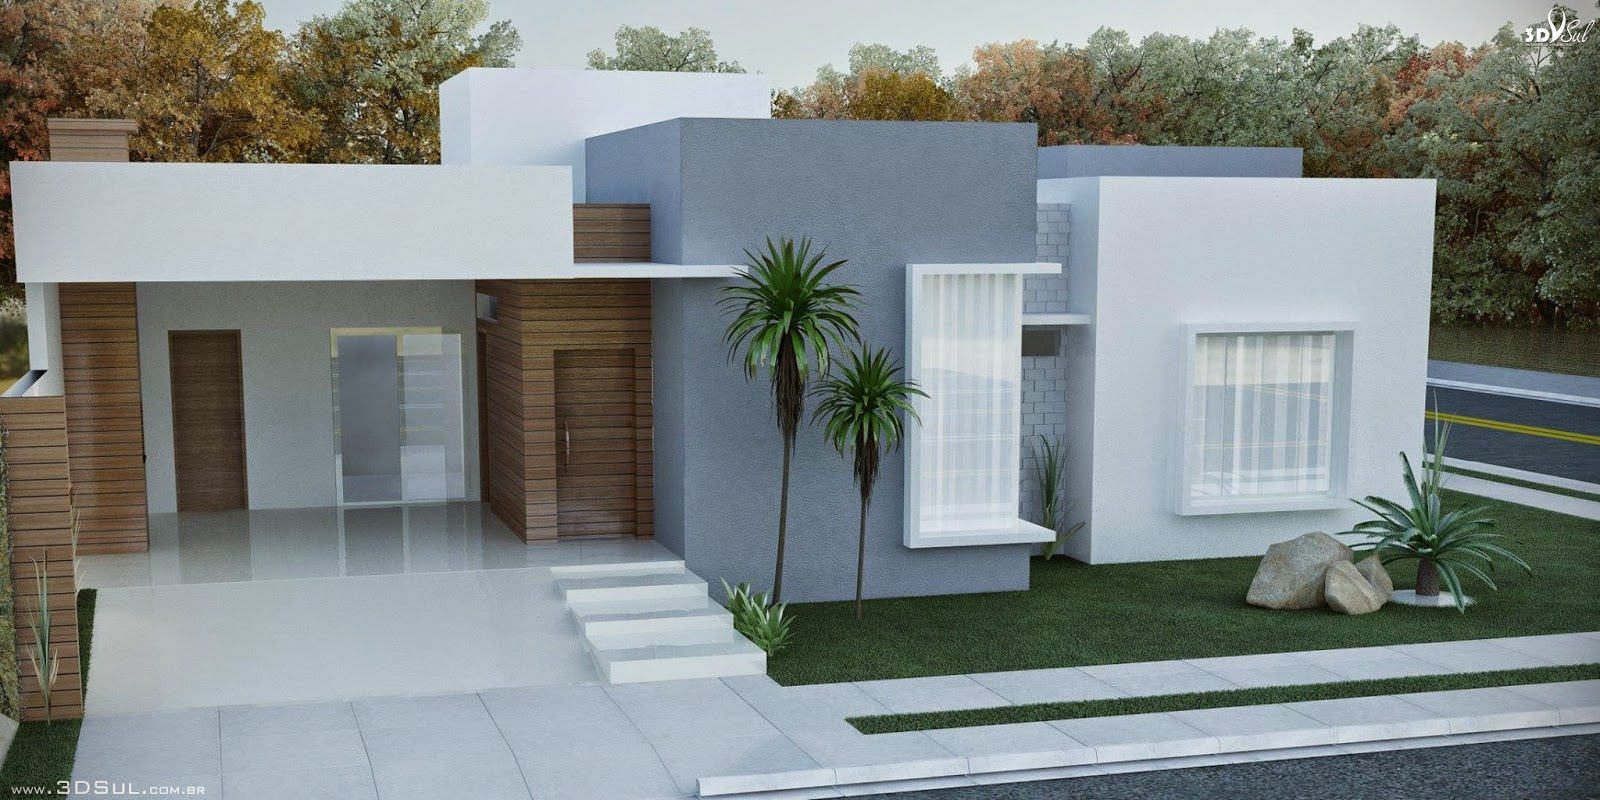 Fotos plantas de casas para construir 81